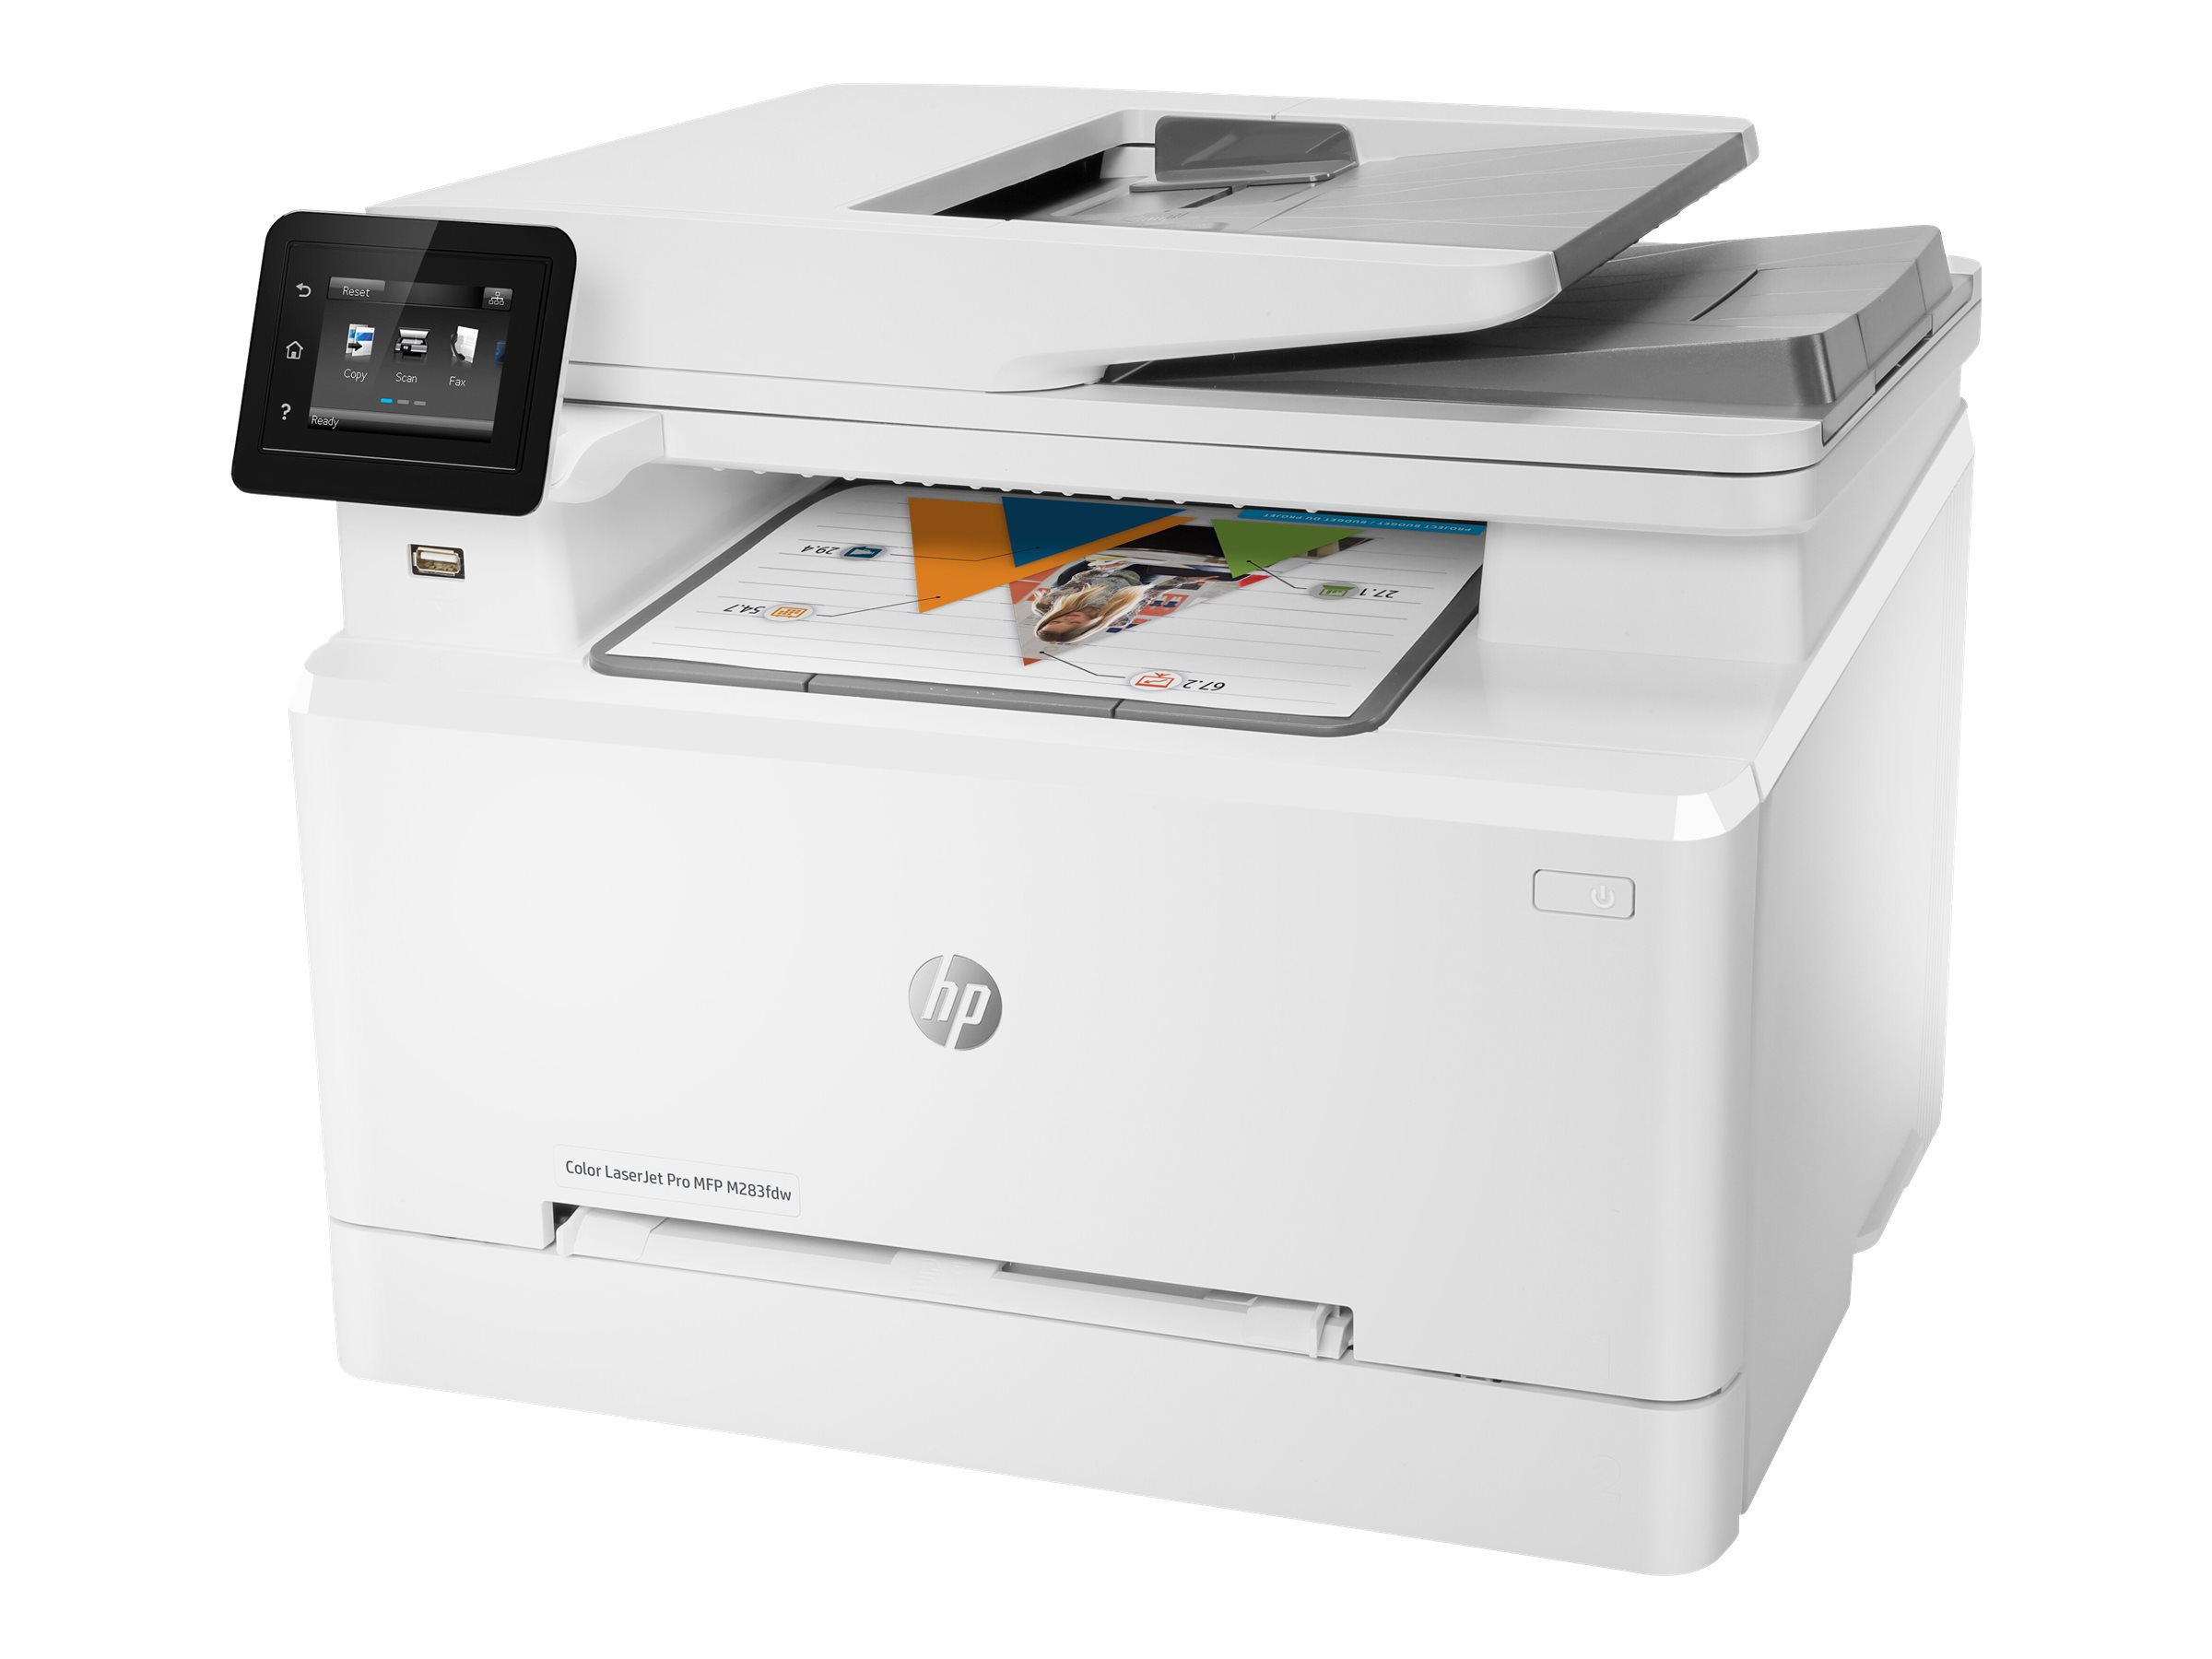 Hp color laserjet pro mfp m283fdw multifunktionsdrucker farbe laser legal 216 x 356 mm original a4 legal medien 12034432 7kw75a b19